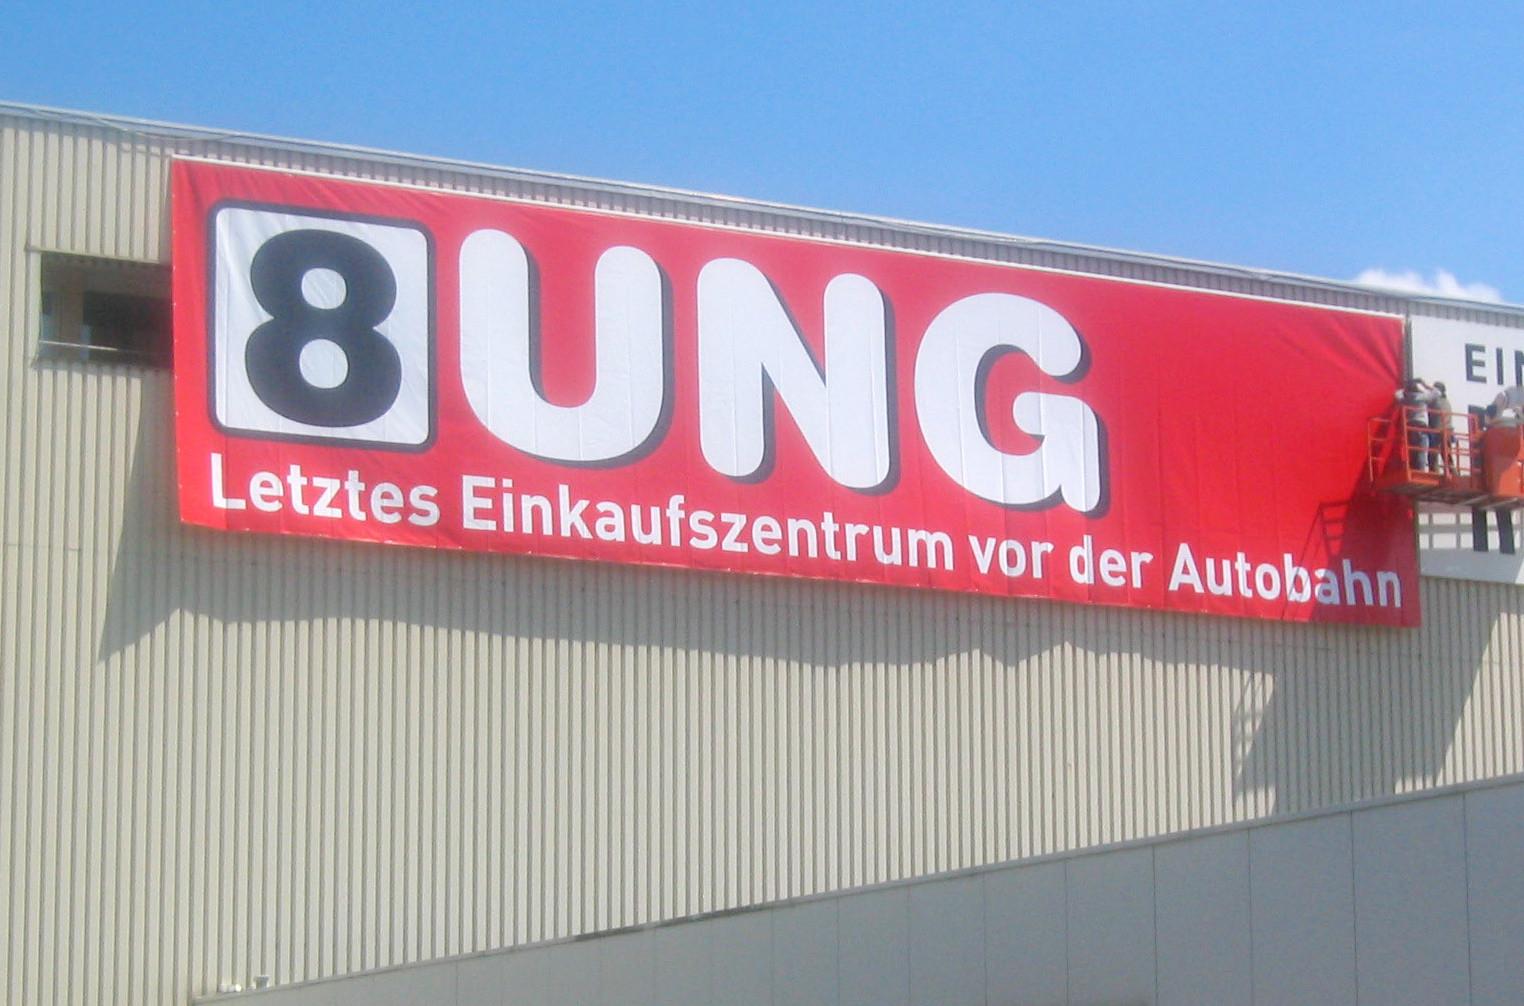 Rosenbergblache.jpg